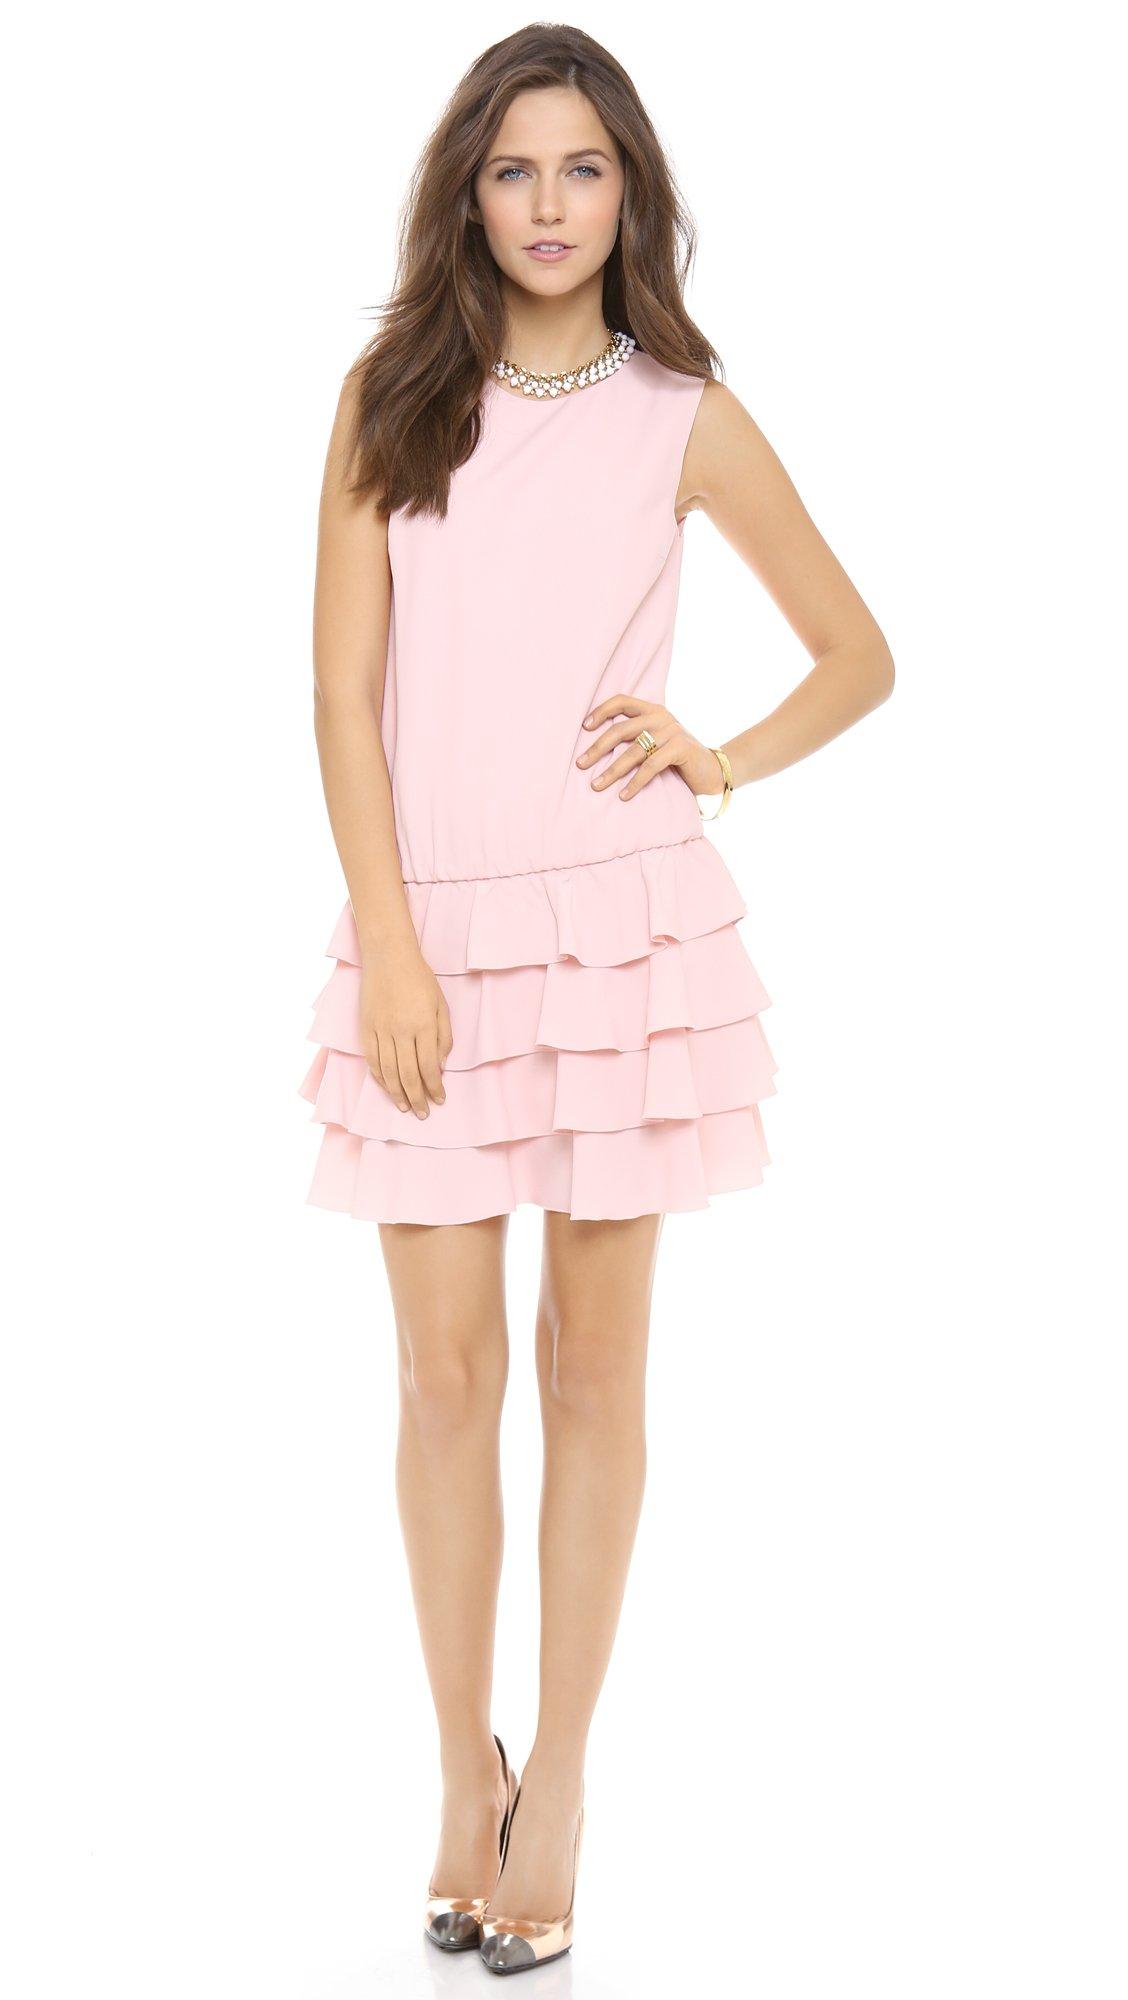 Red Valentino Drop Waist Ruffle Dress in Pink (Confetti ...